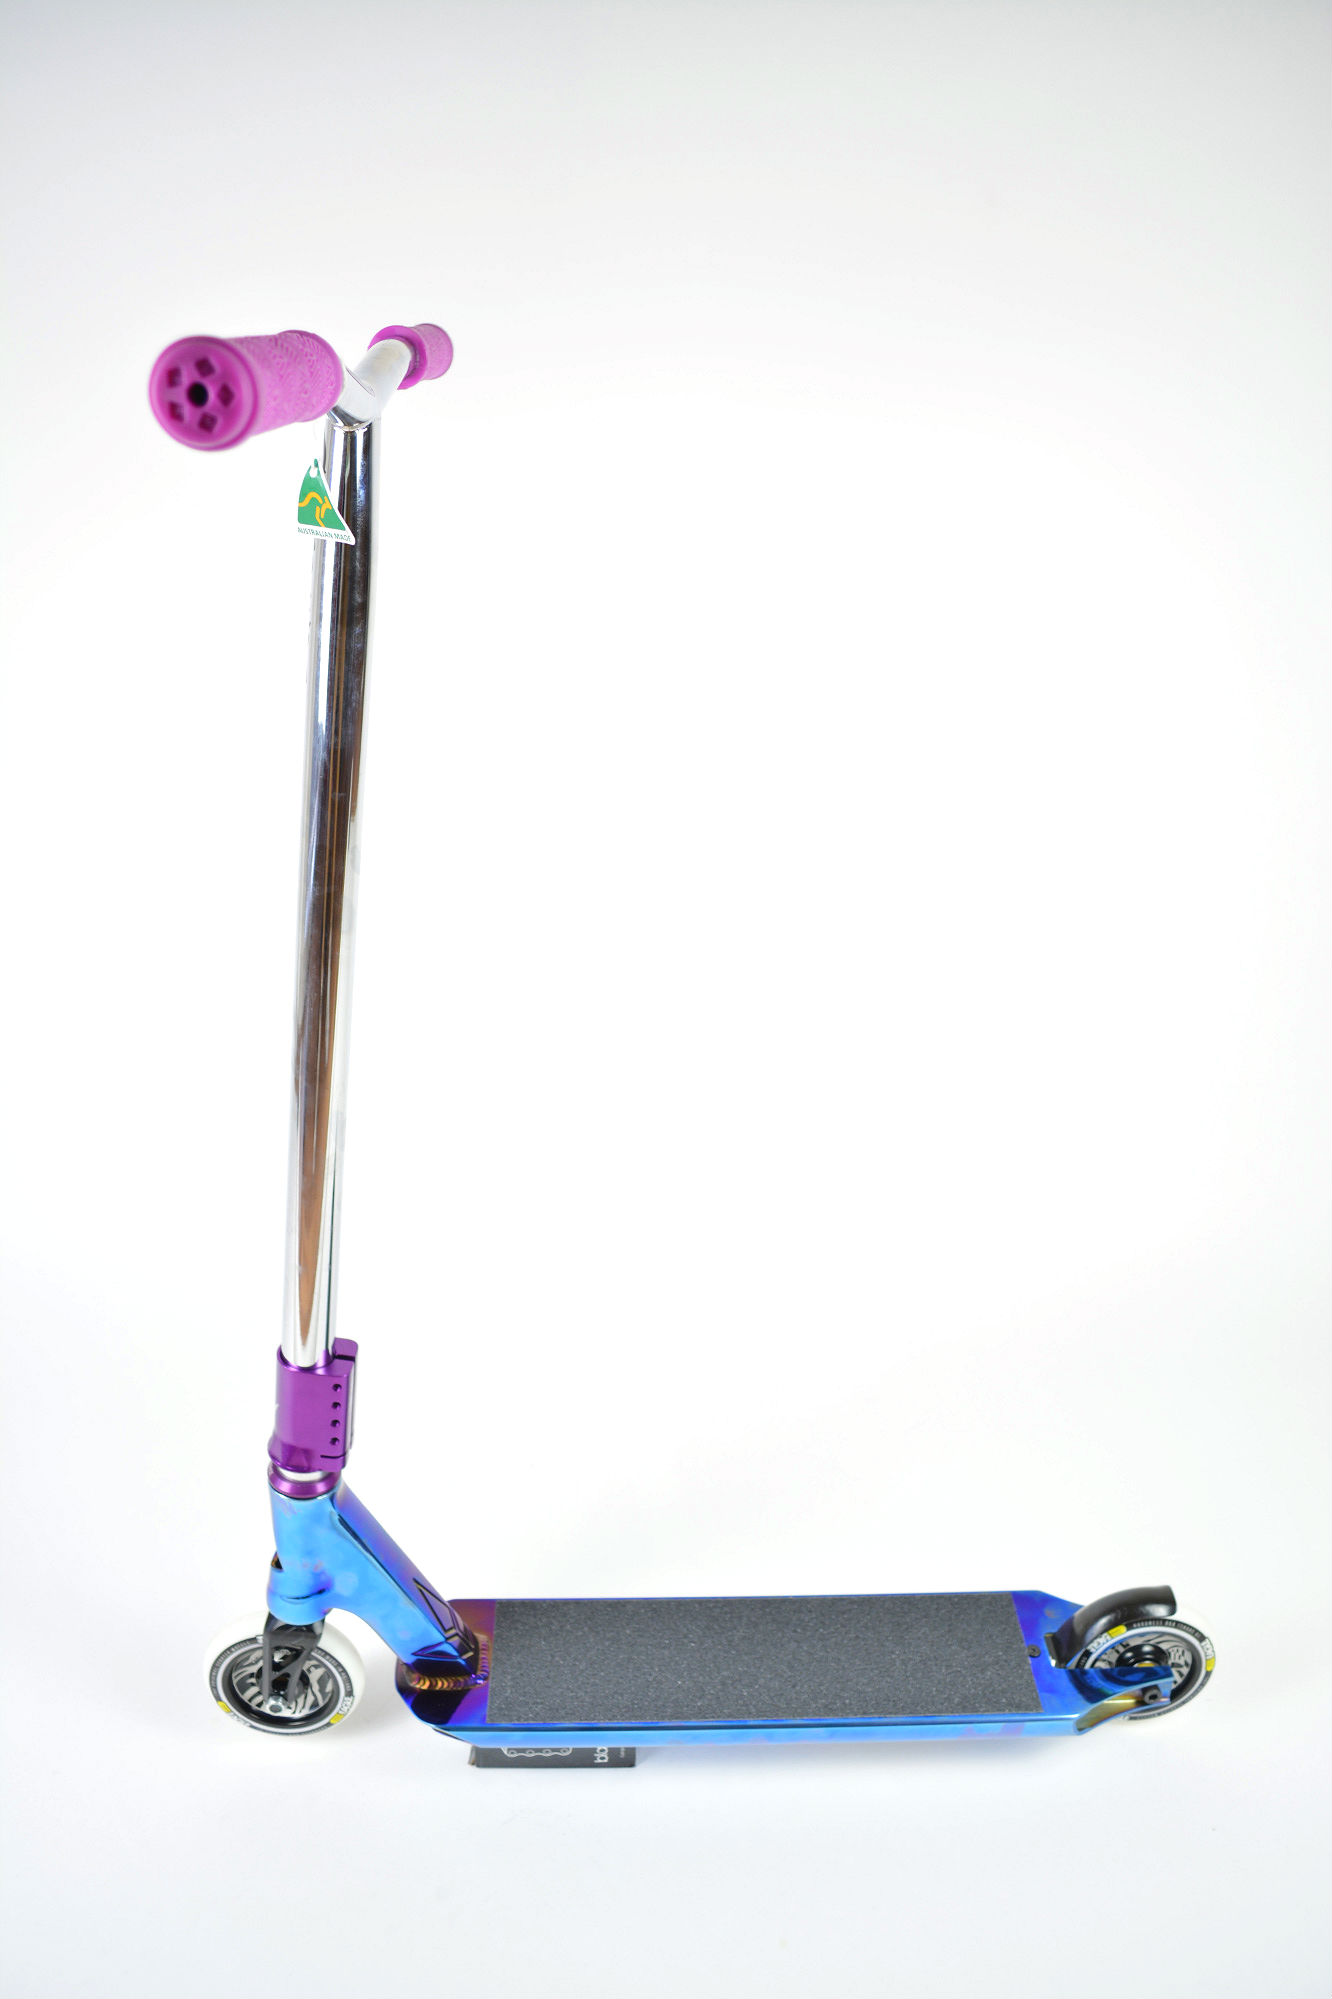 Blunt AOS V3 Jesse Ikedah Apex Custom Stunt Scooter